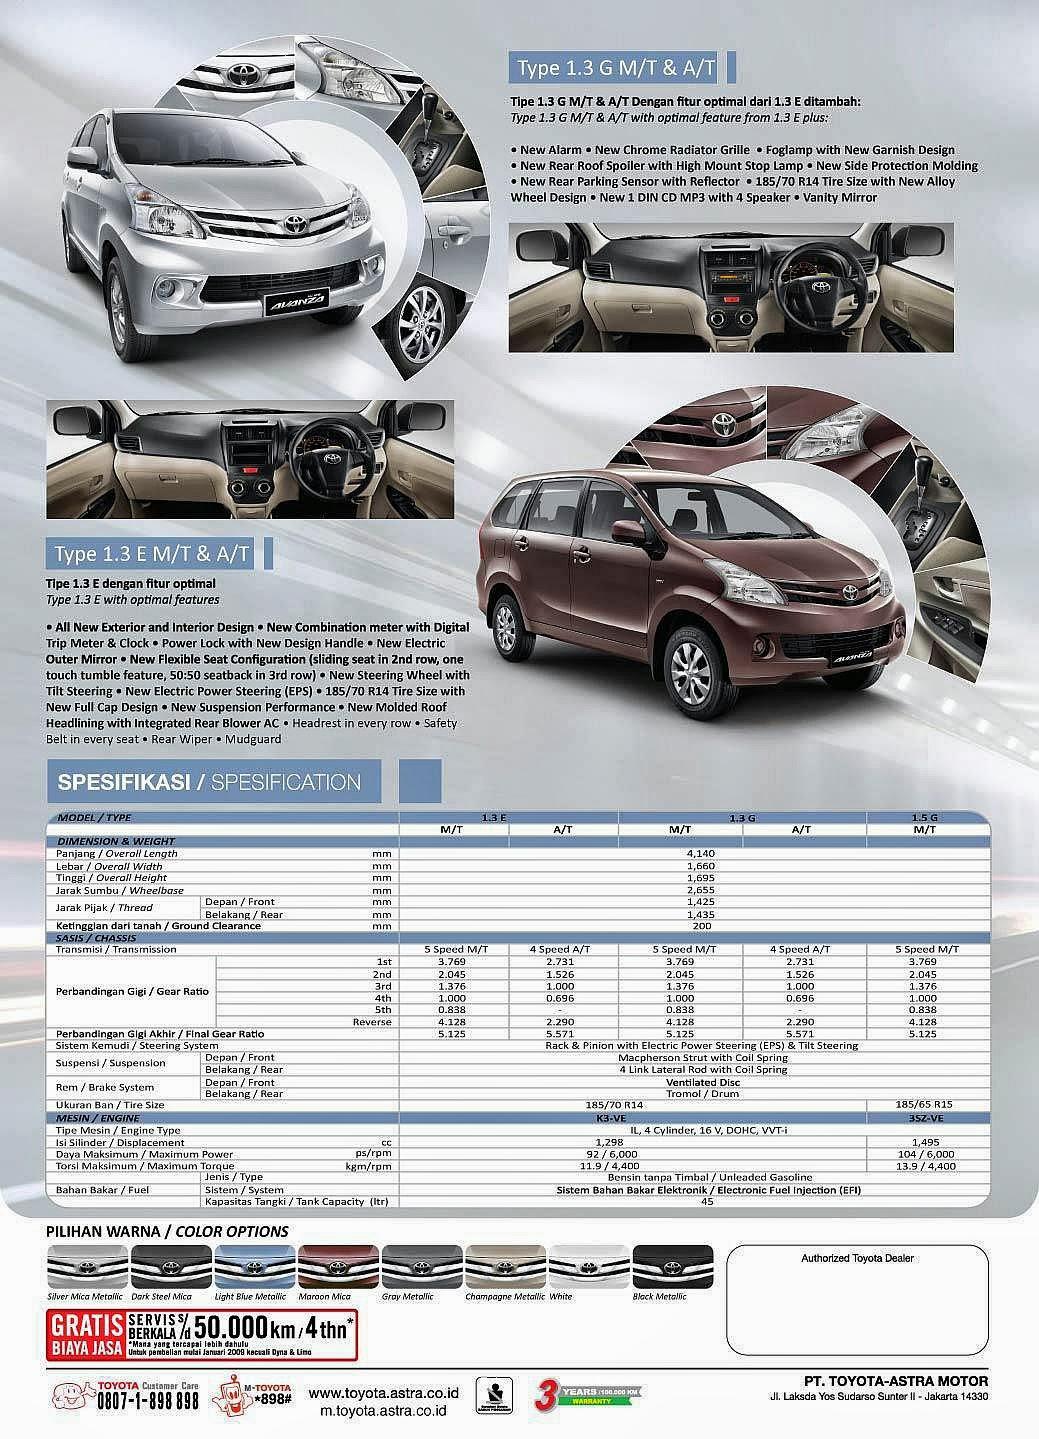 Brosur Grand New Avanza 2018 Silent Remote Toyota 2017 Kediri